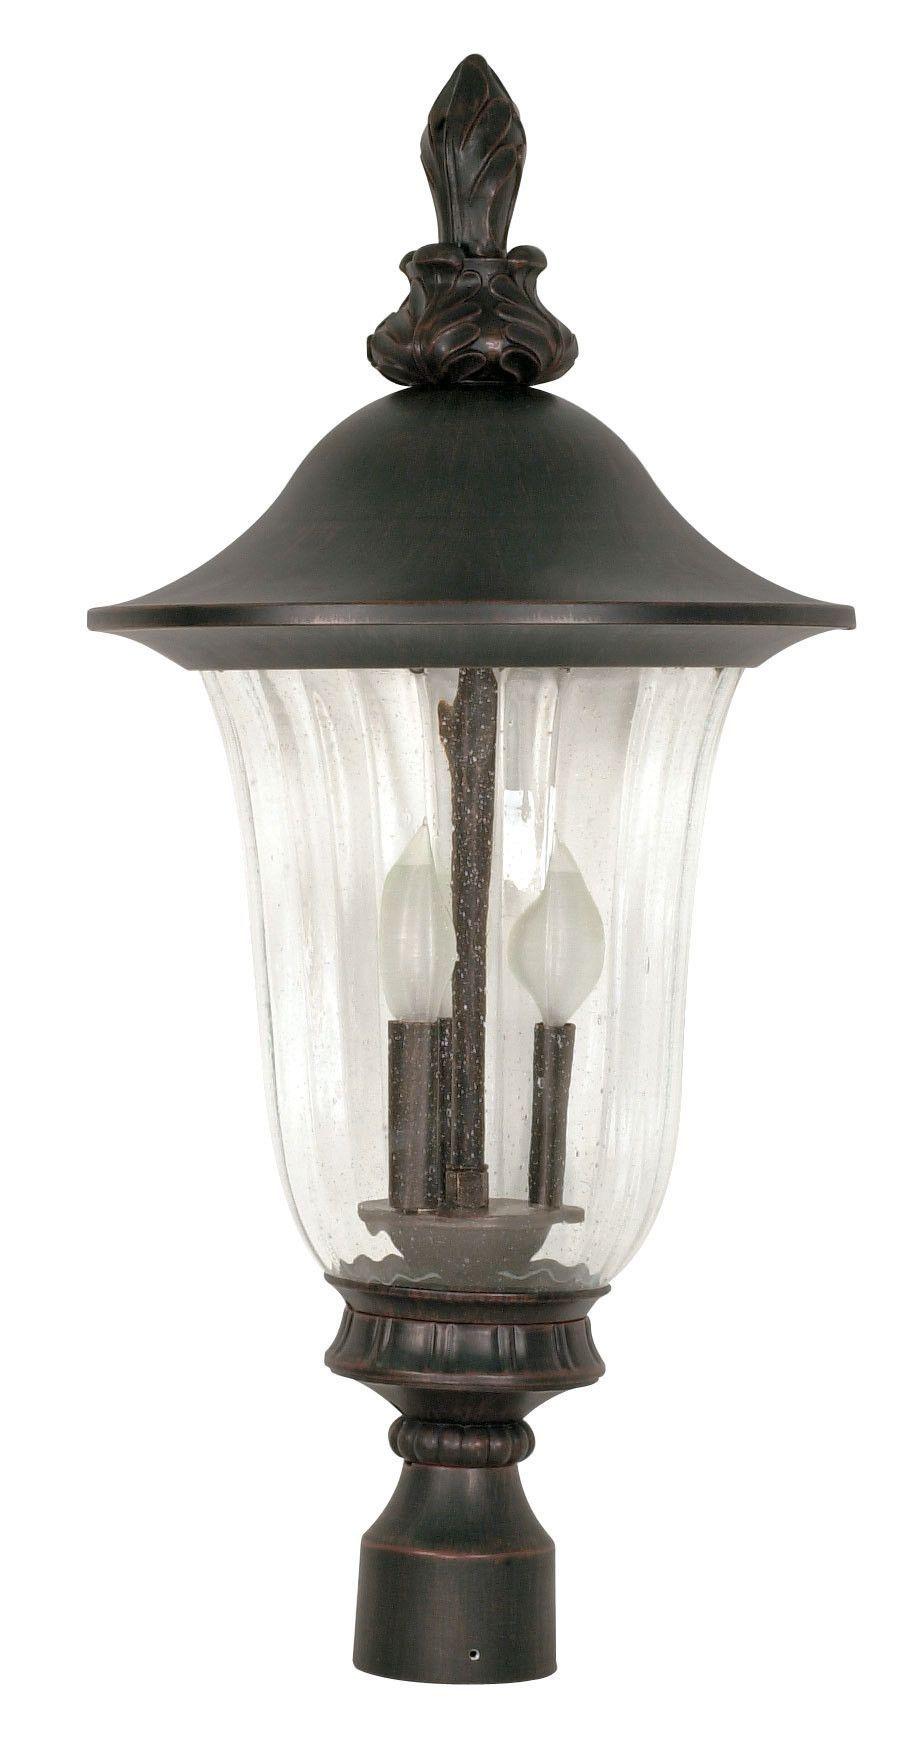 Nuvo Lighting Parisian Post Lantern Outdoor Post Lights Post Lights Lantern Post